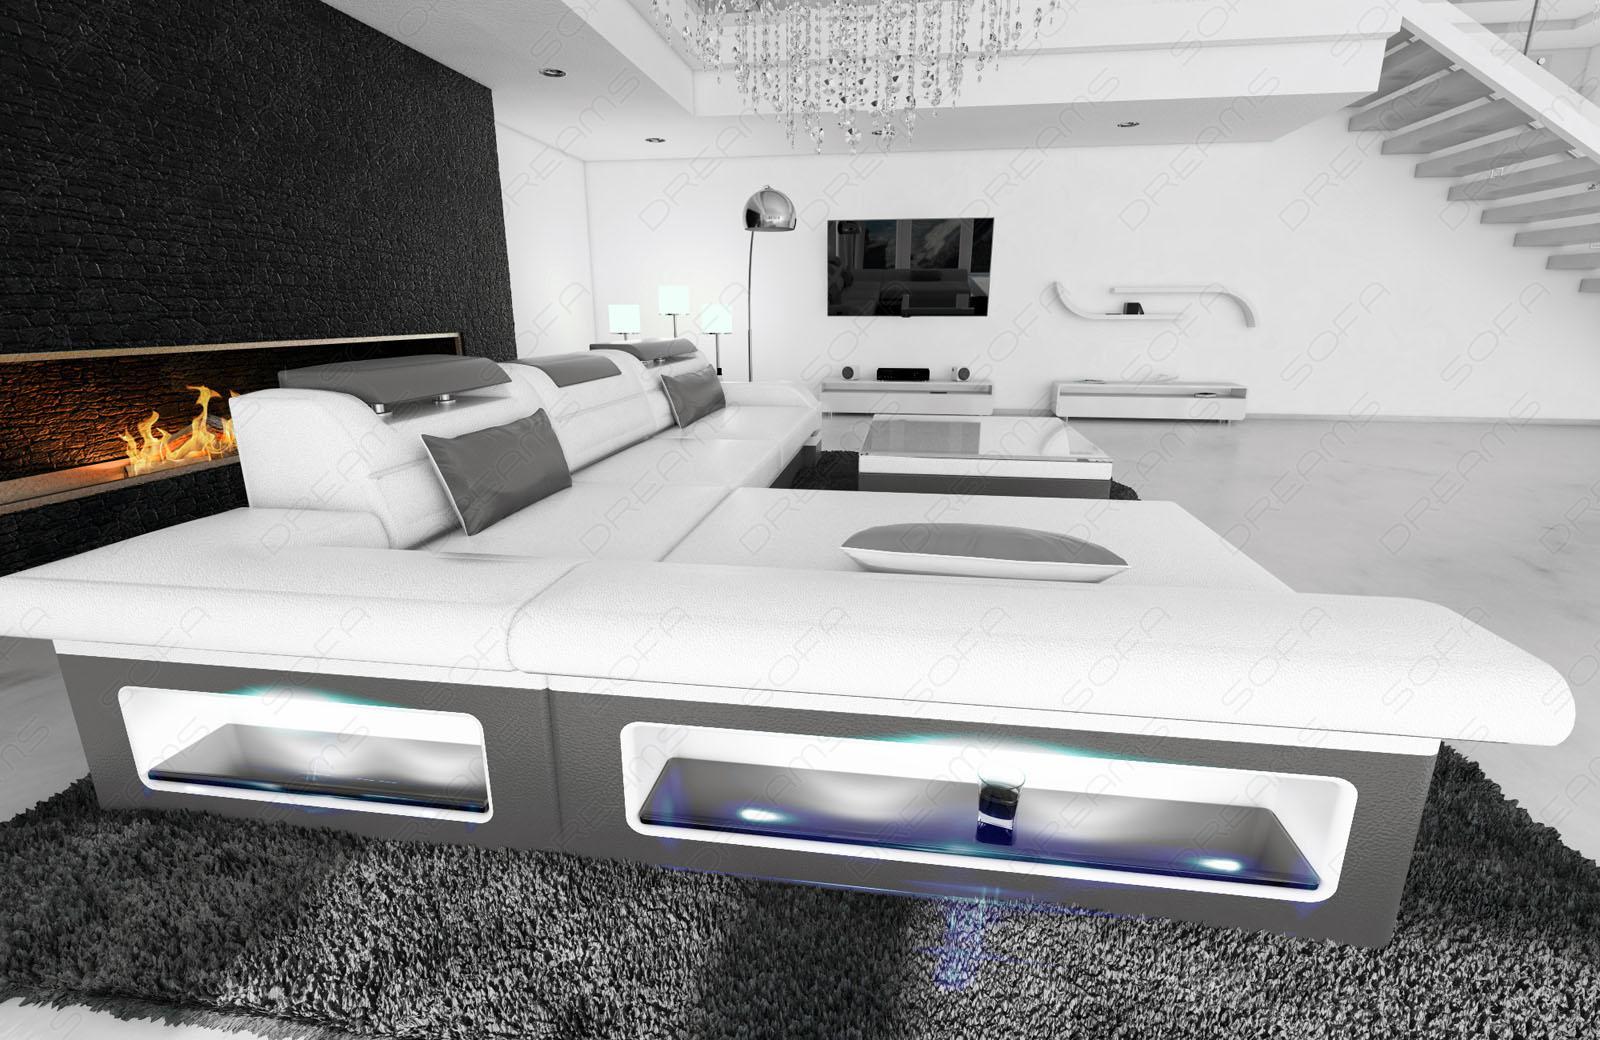 ledersofa monza l weiss grau kaufen bei pmr. Black Bedroom Furniture Sets. Home Design Ideas